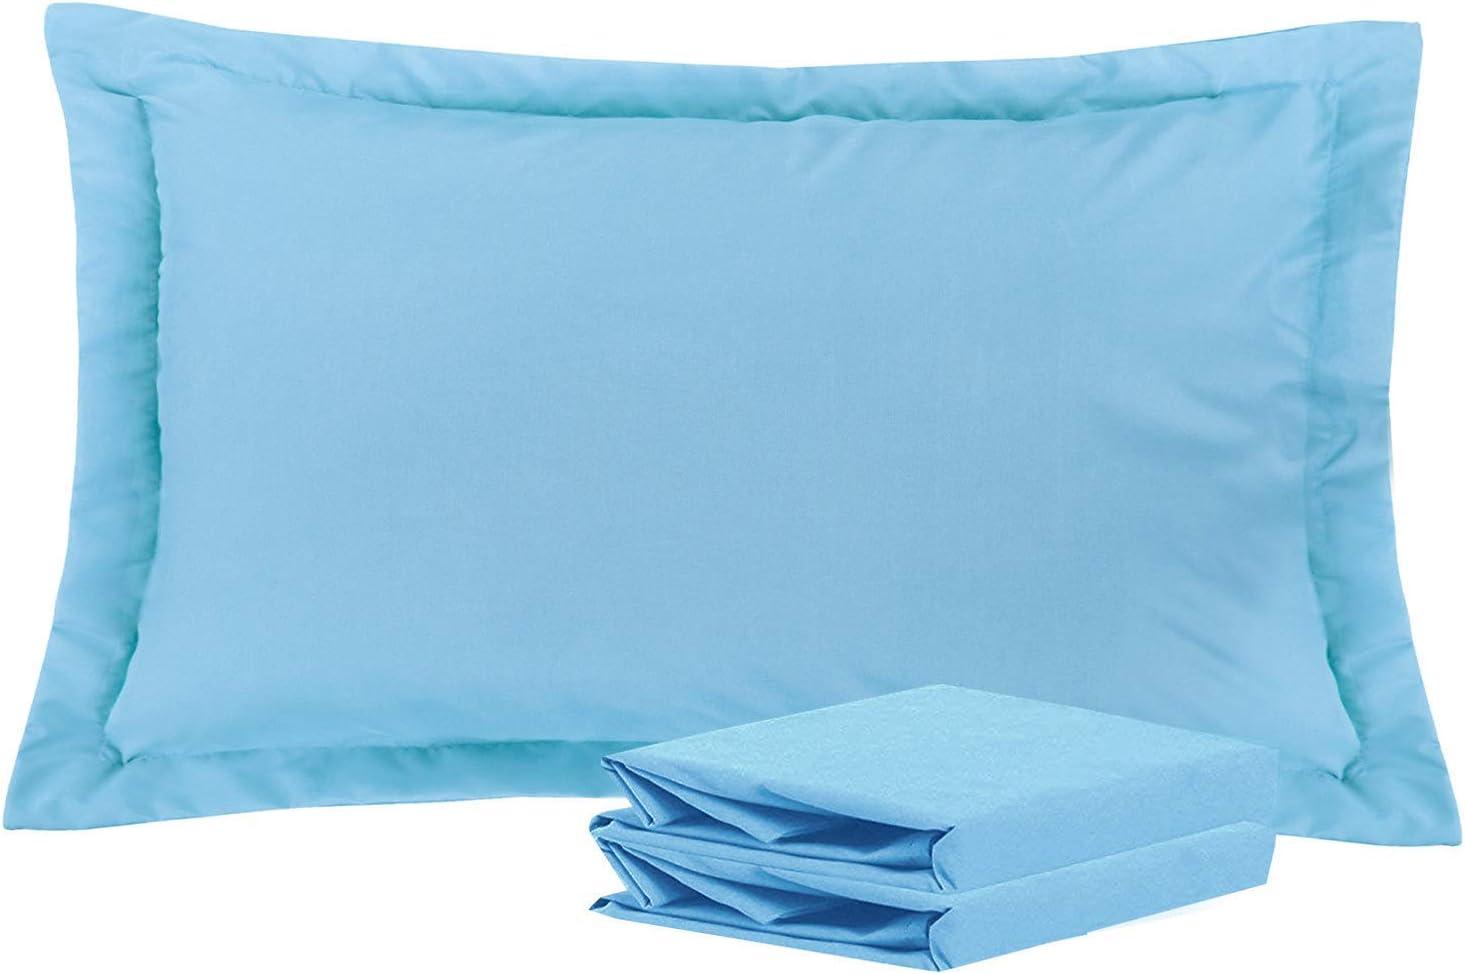 British Choice Linen Pillowcase Travel